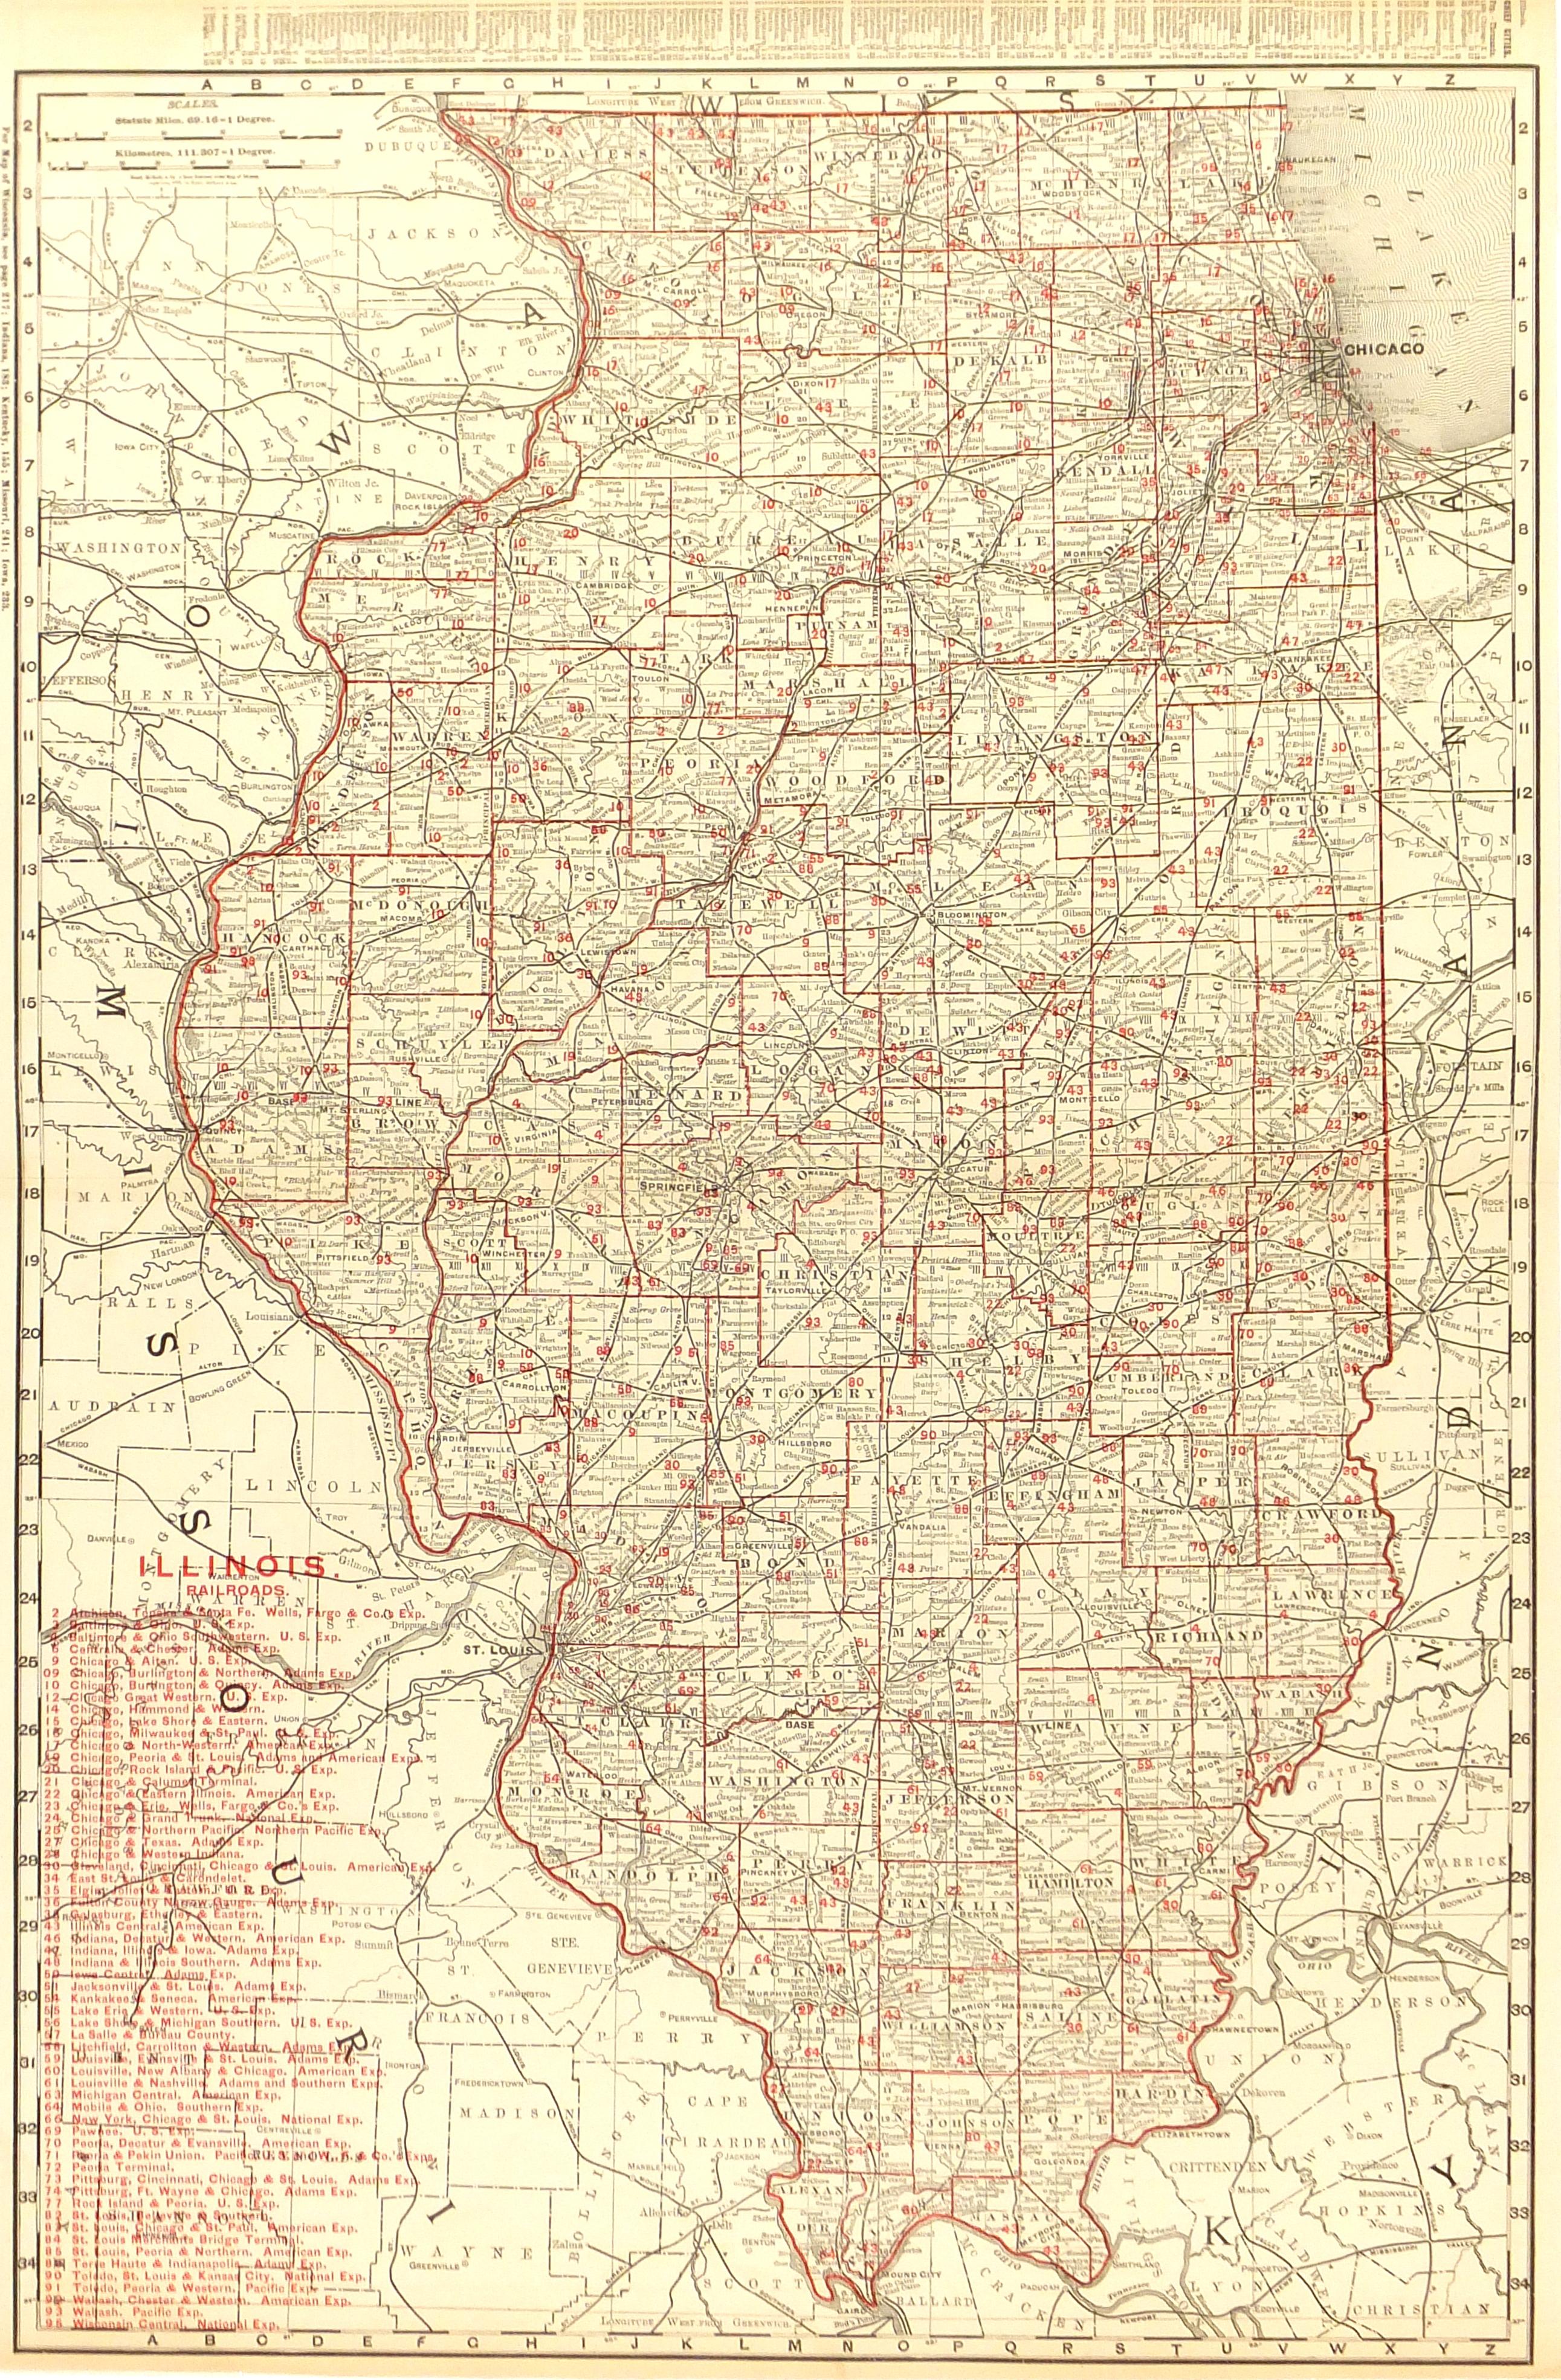 Illinois Counties & Railroads Map, 1895-main-6556K